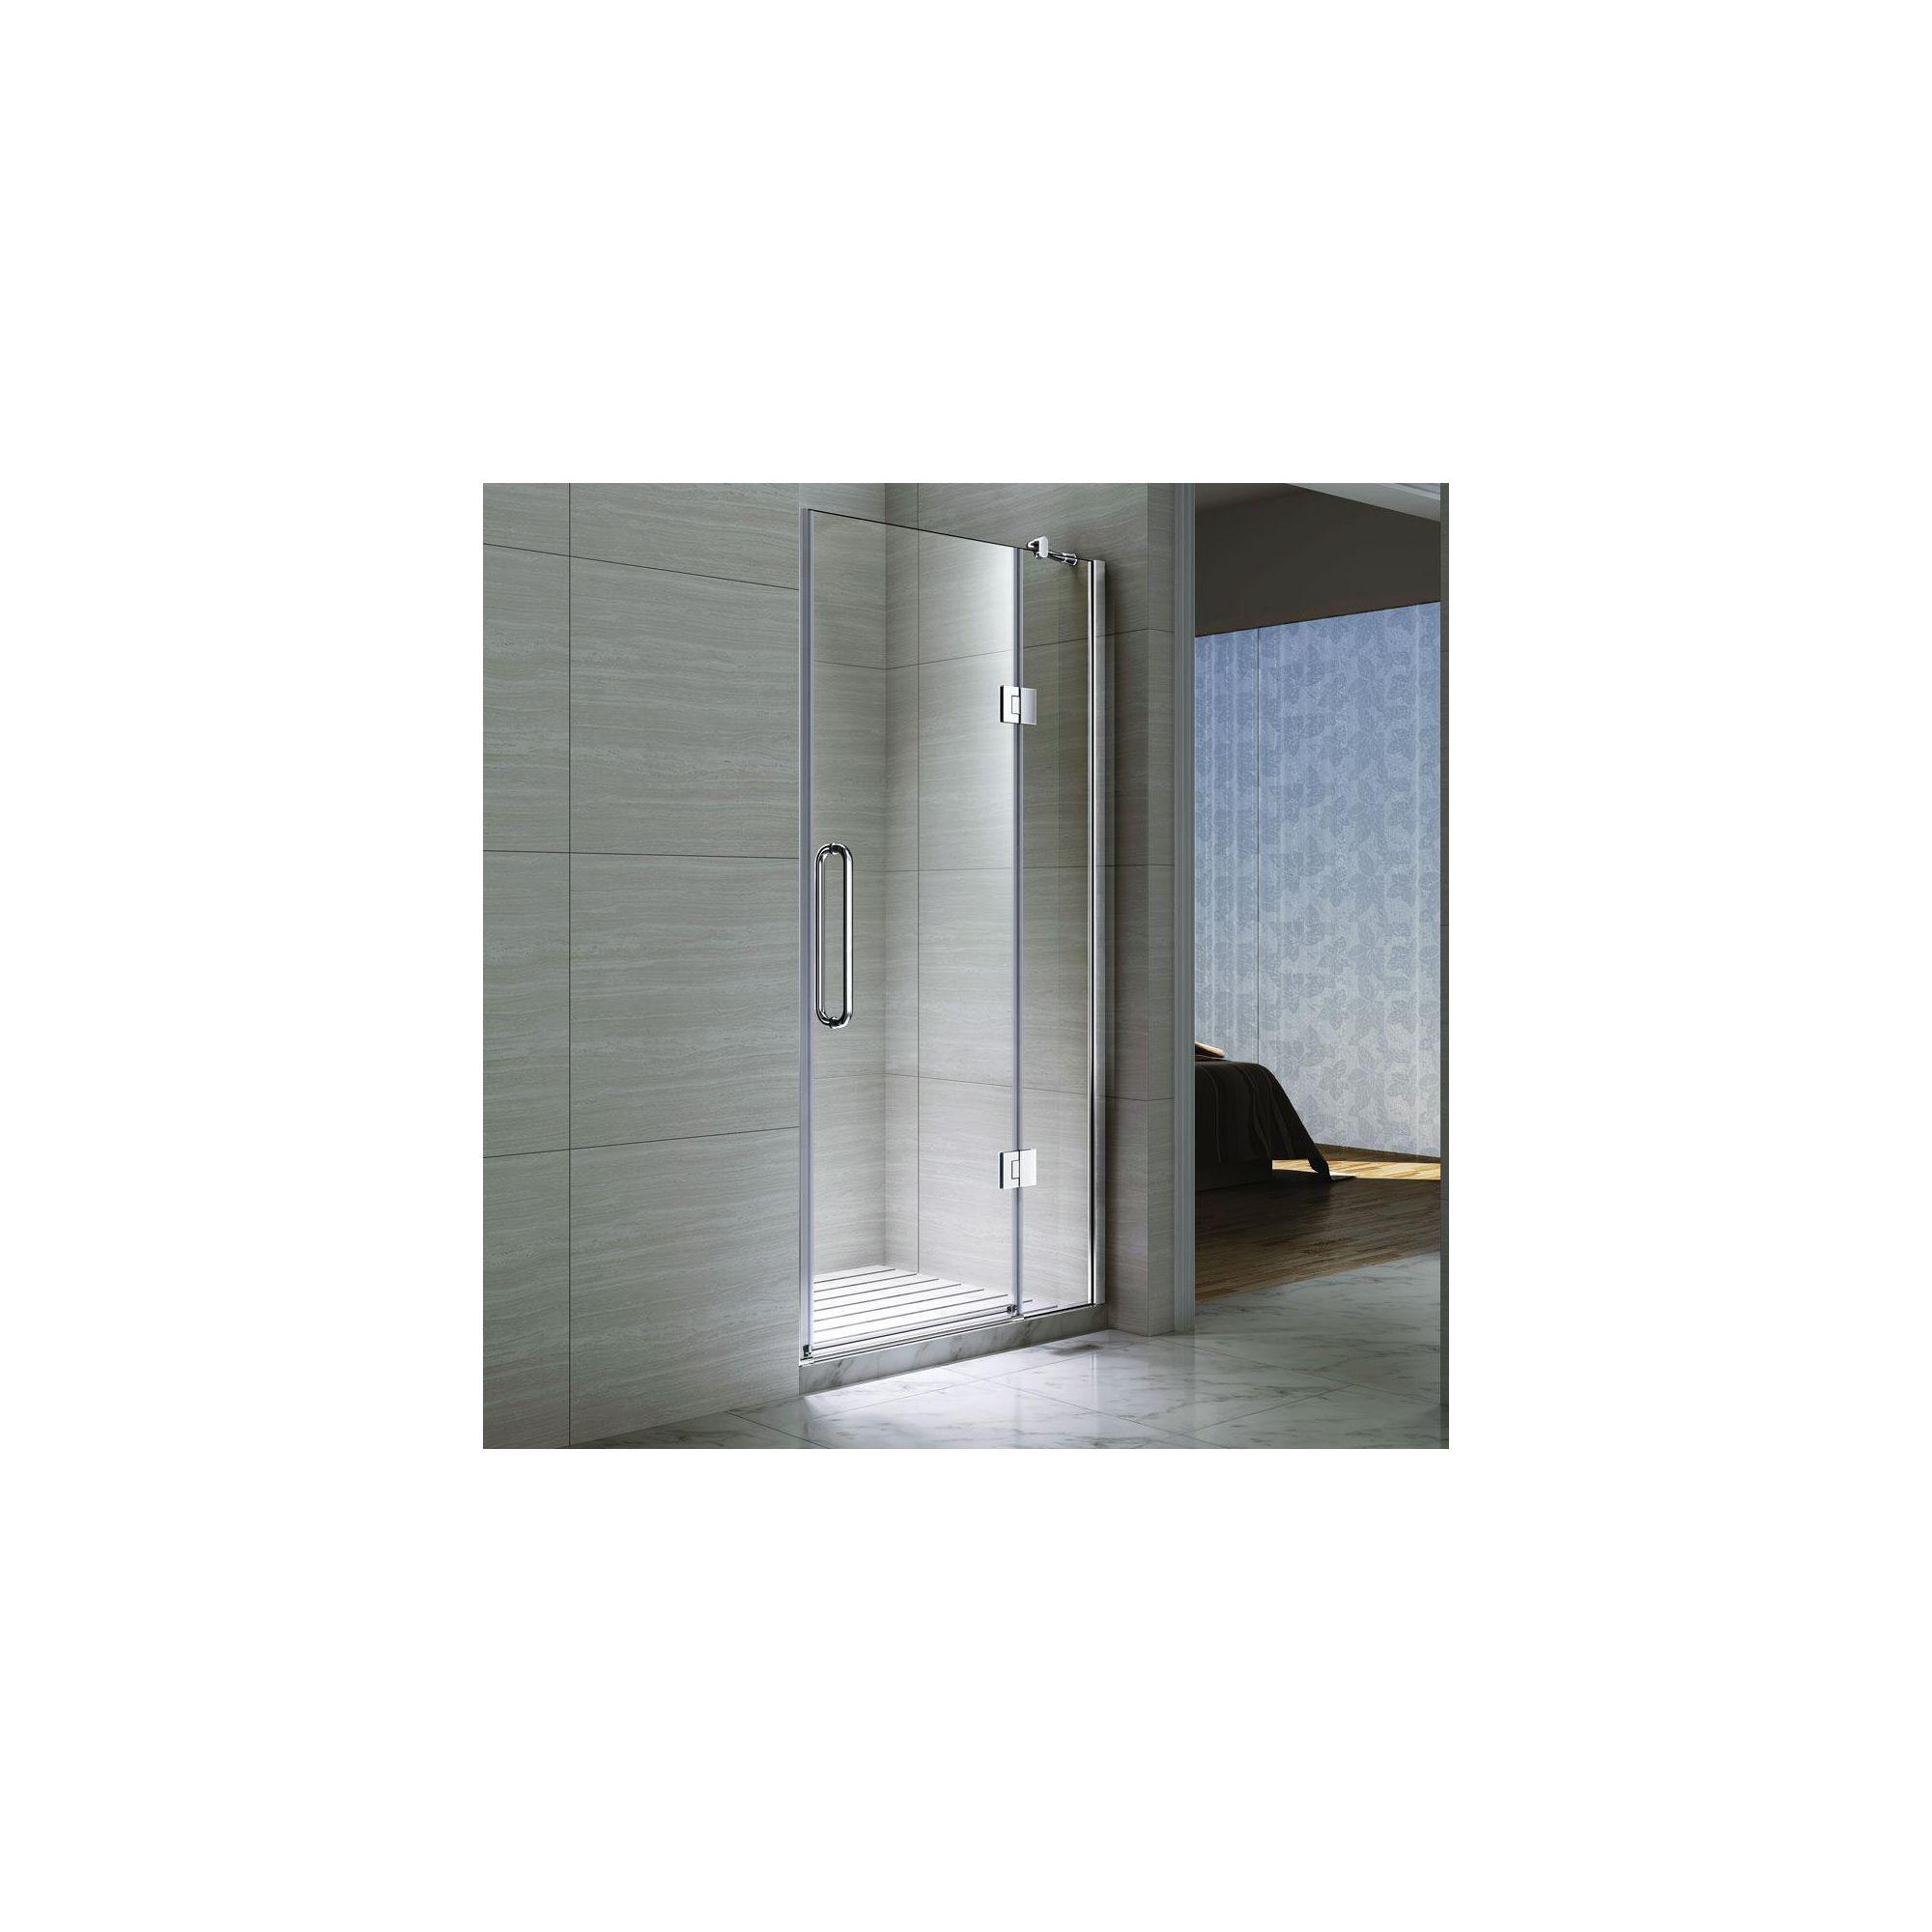 Desire Ten Inline Hinged Shower Door, 900mm Wide, Semi-Frameless, 10mm Glass at Tesco Direct